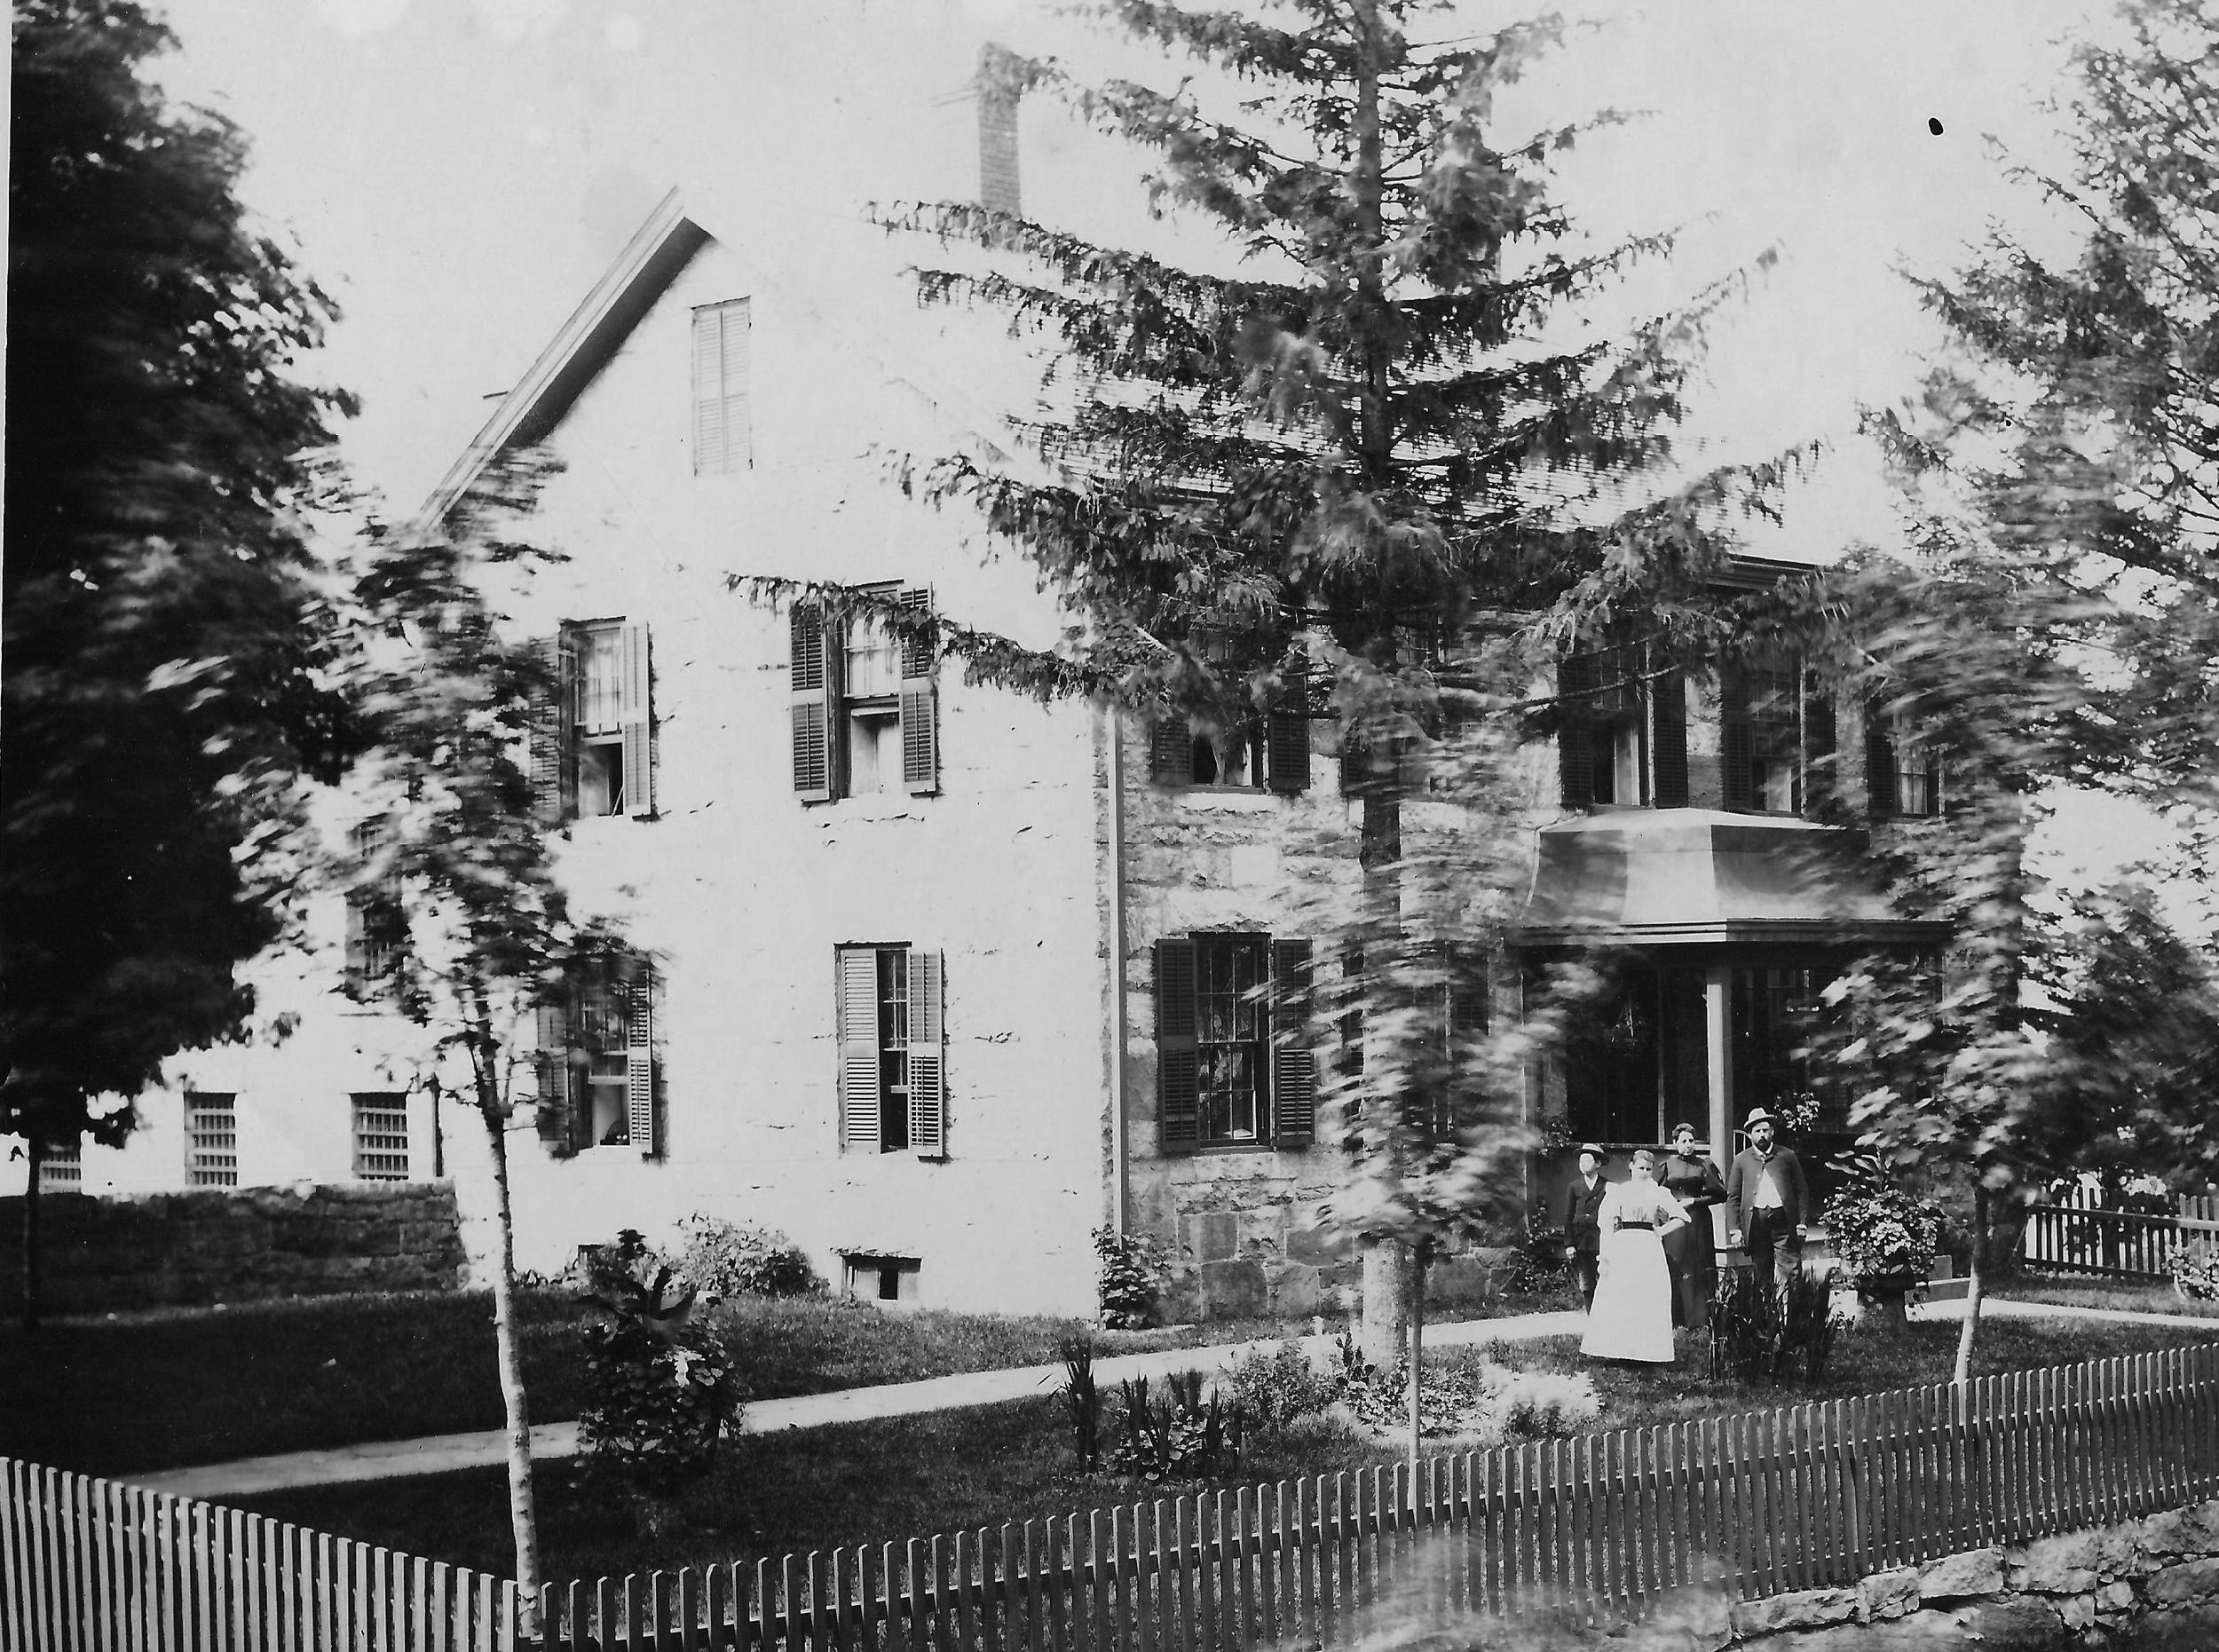 Washington County Jail c. 1898